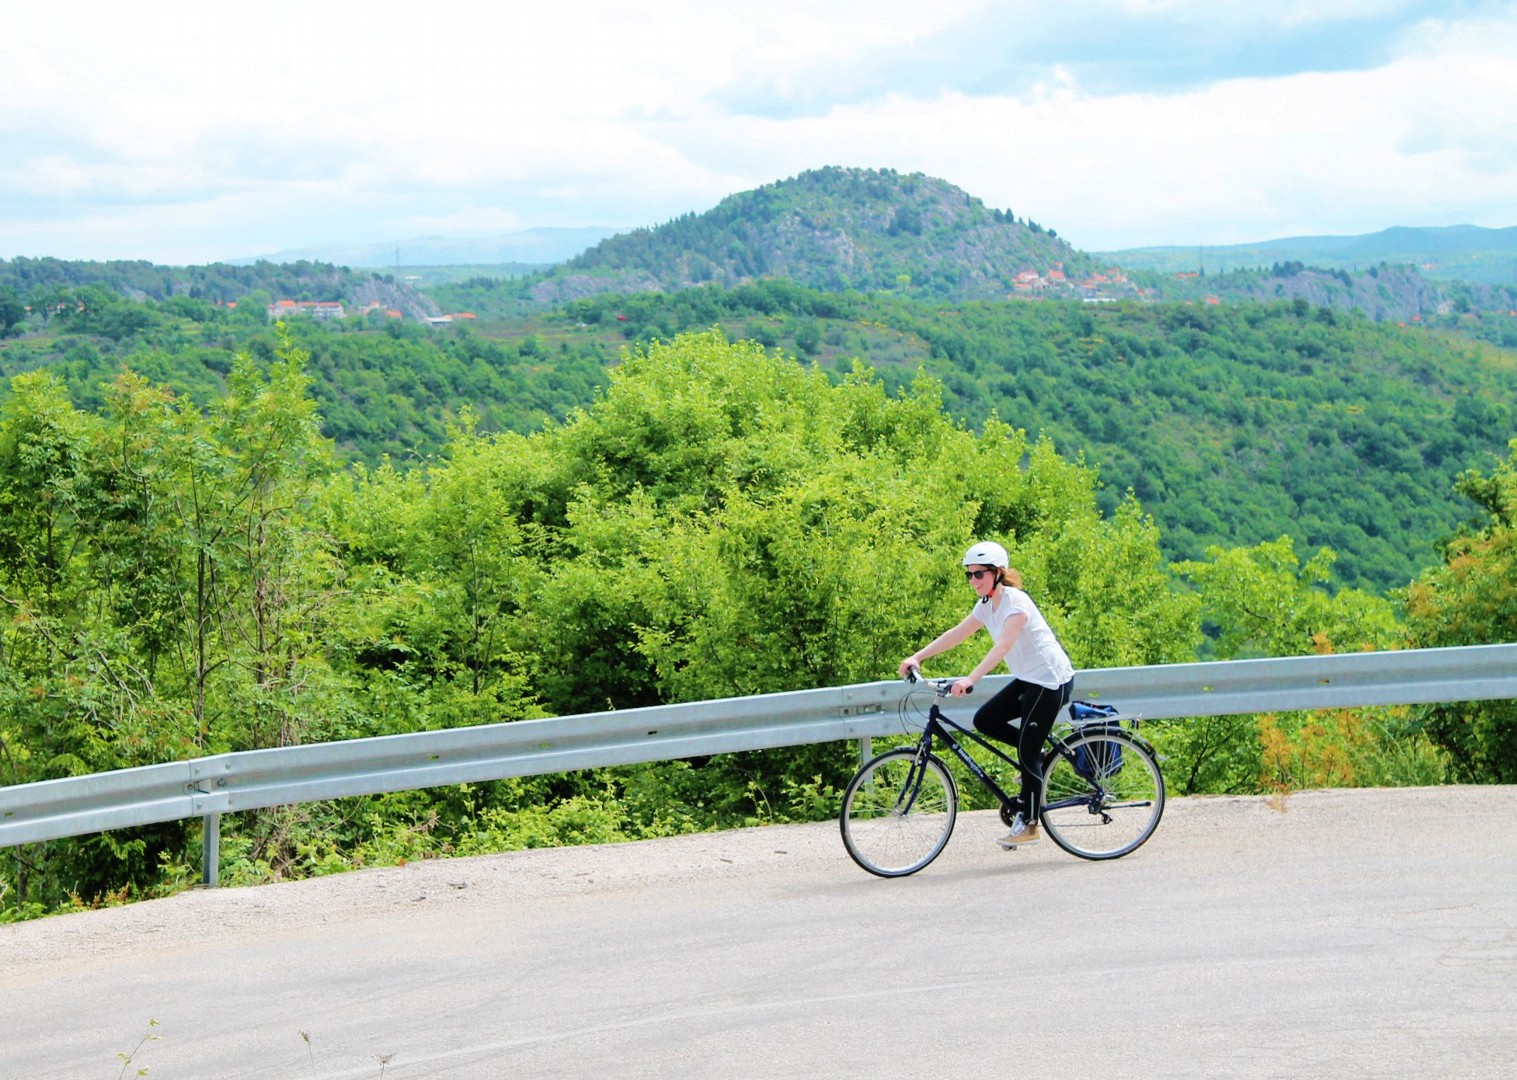 dalmatian-national-park-croatia-cycling-trip.jpg - Croatia - Dalmatian National Parks and Islands - Bike and Boat Holiday - Leisure Cycling